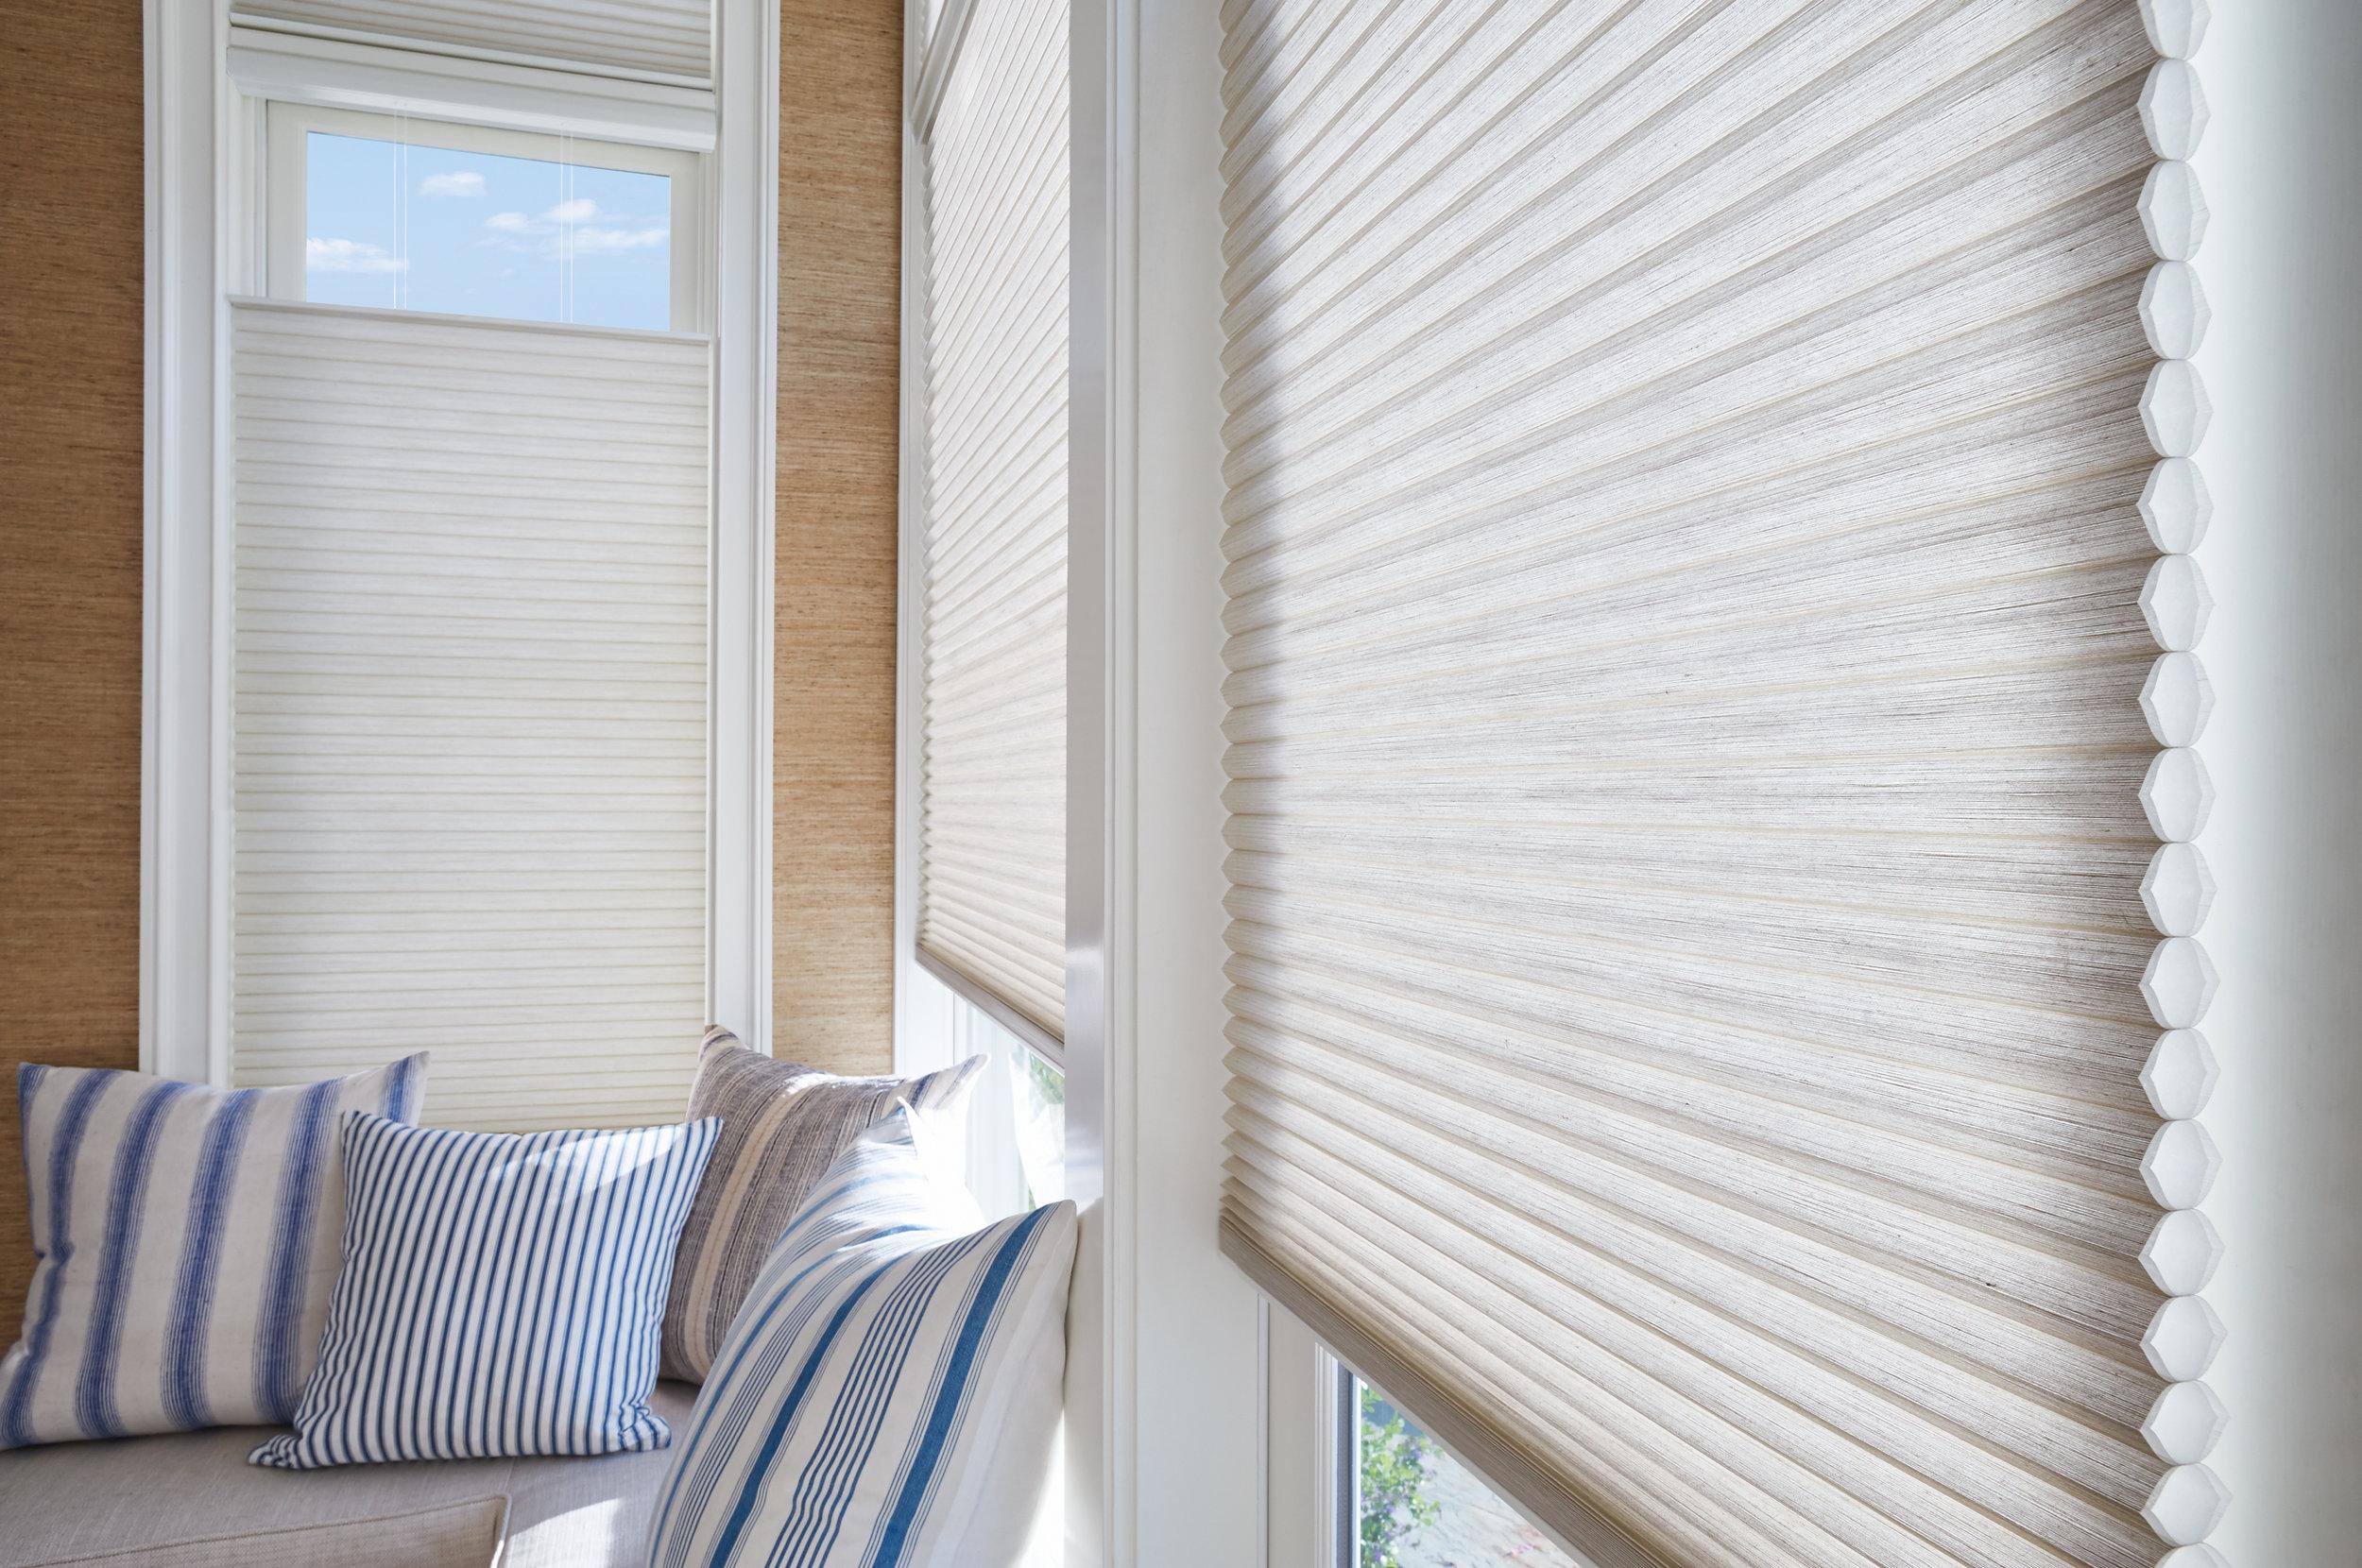 2016_DU_LR_PV_Coastal_Fabric Detail_No Wall Unit.jpg